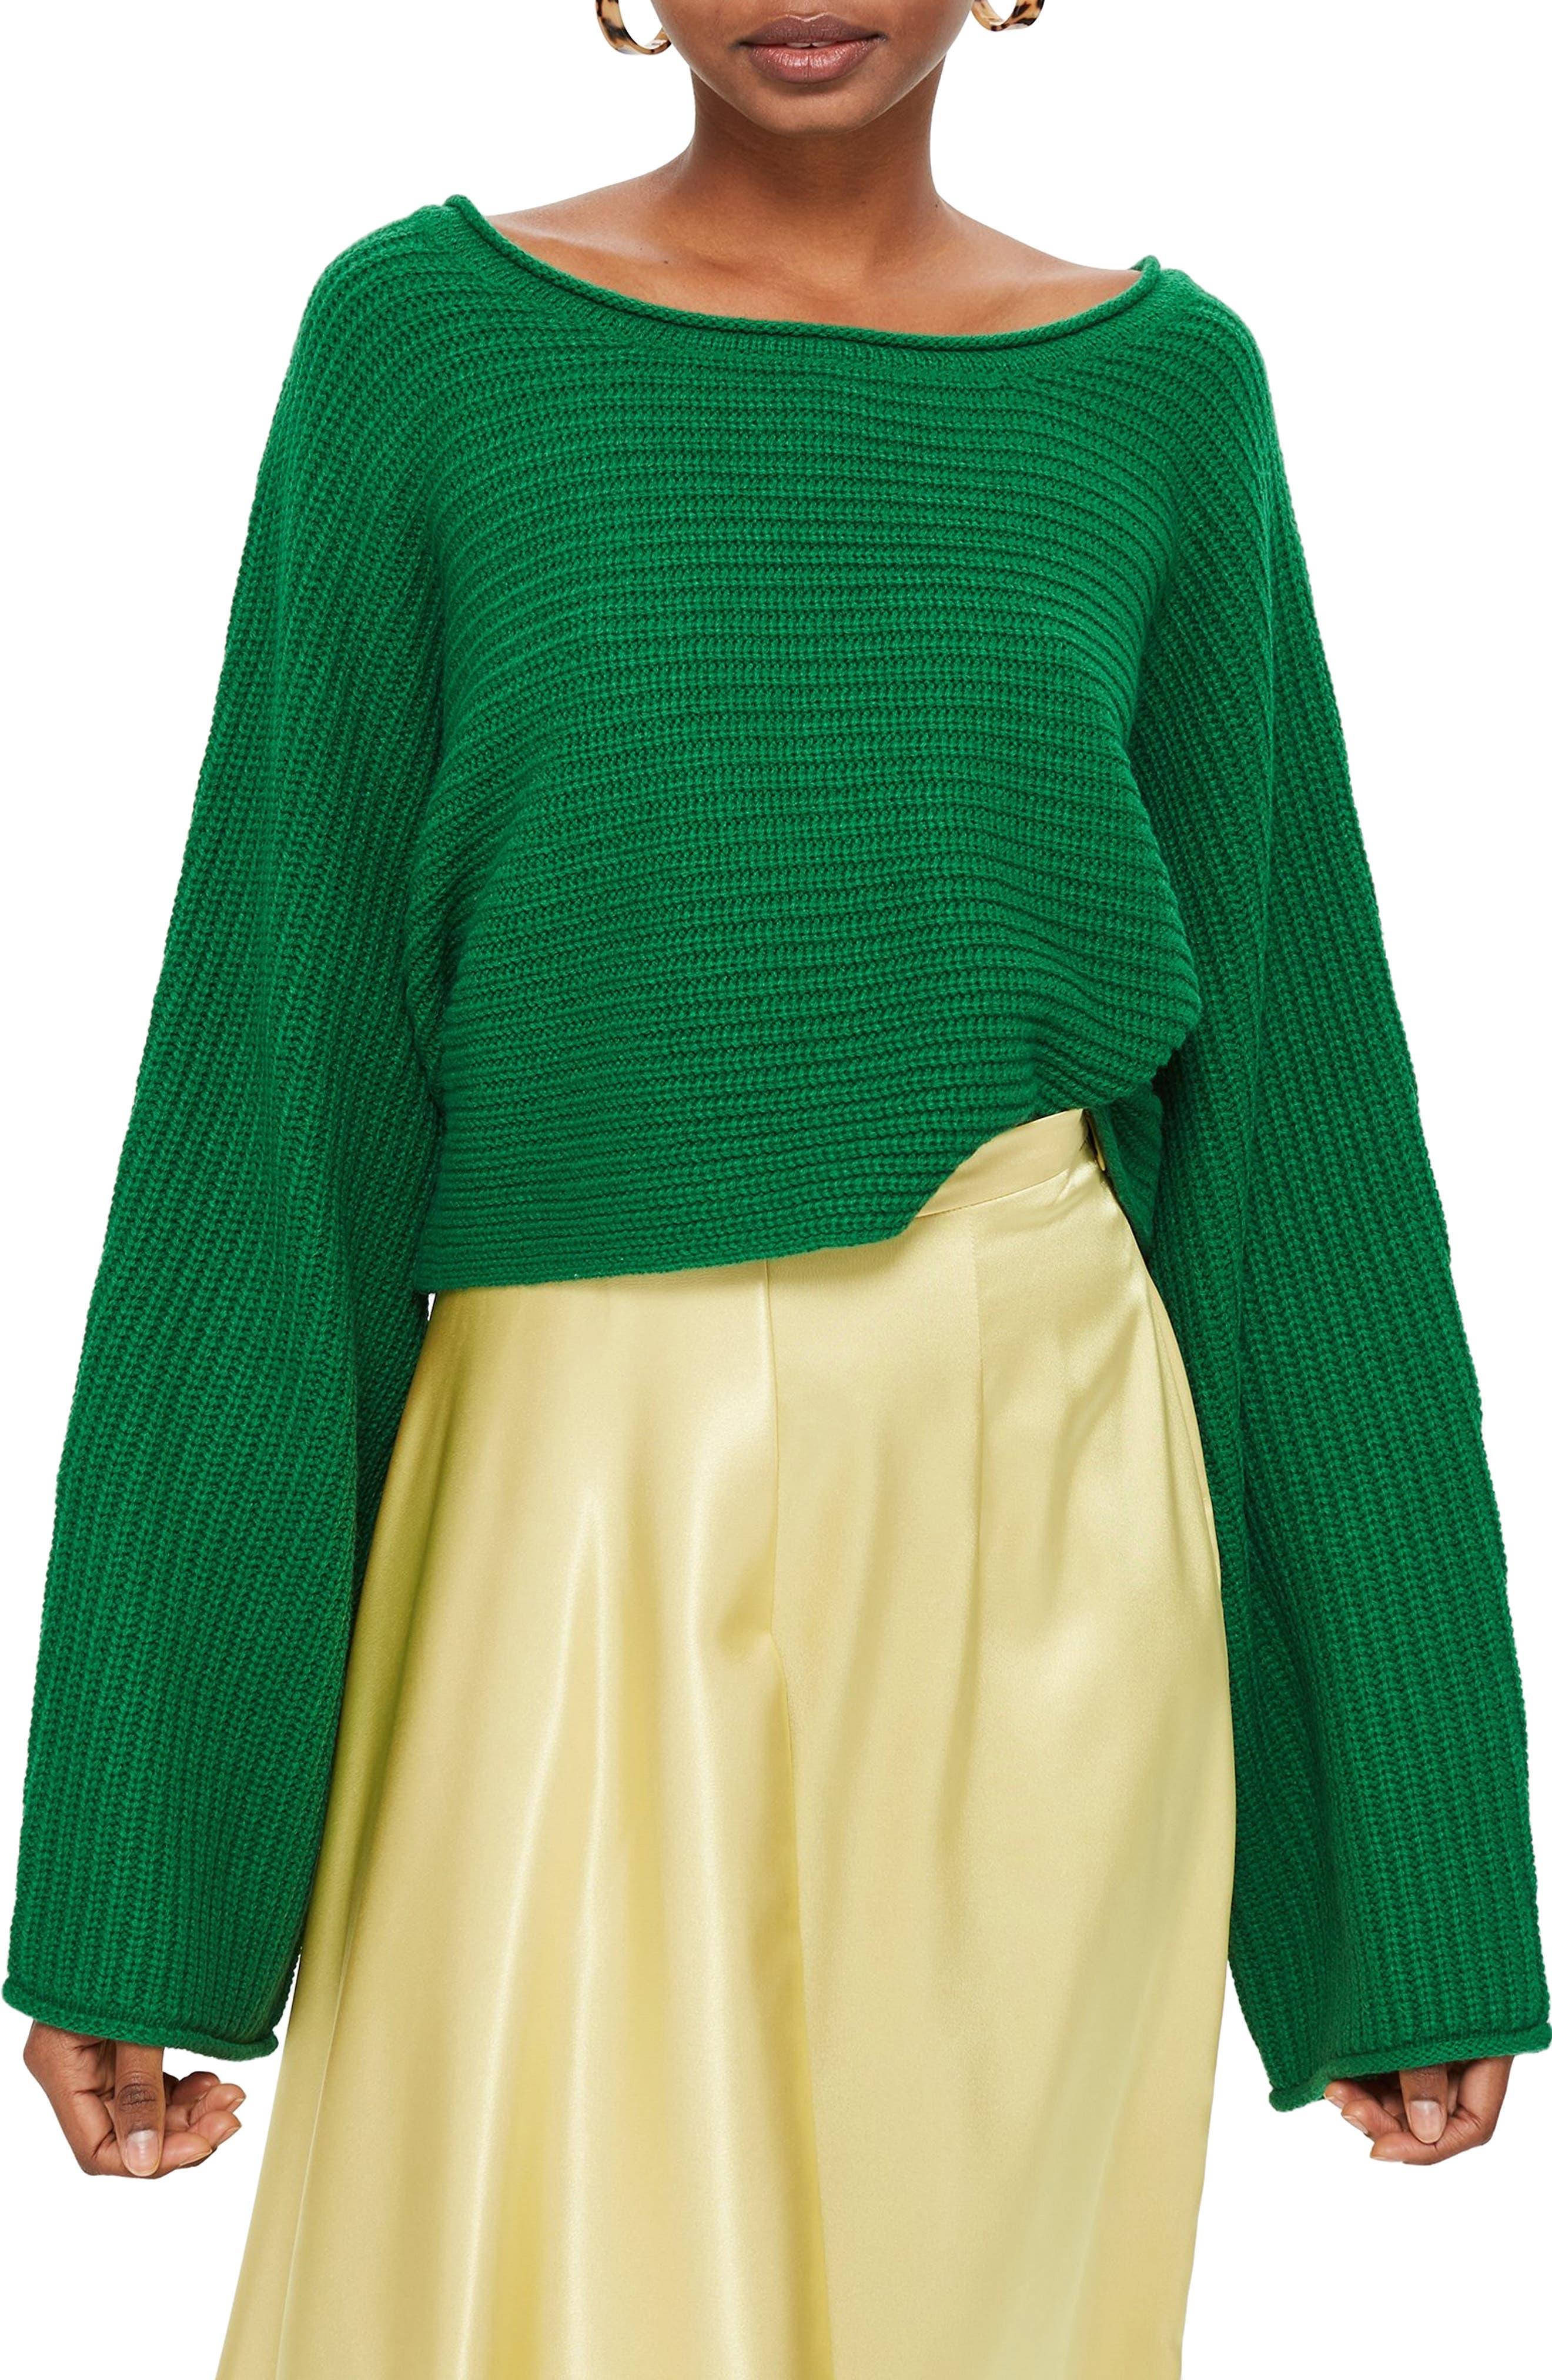 TOPSHOP, Roll Edge Crop Sweater, Main thumbnail 1, color, 300